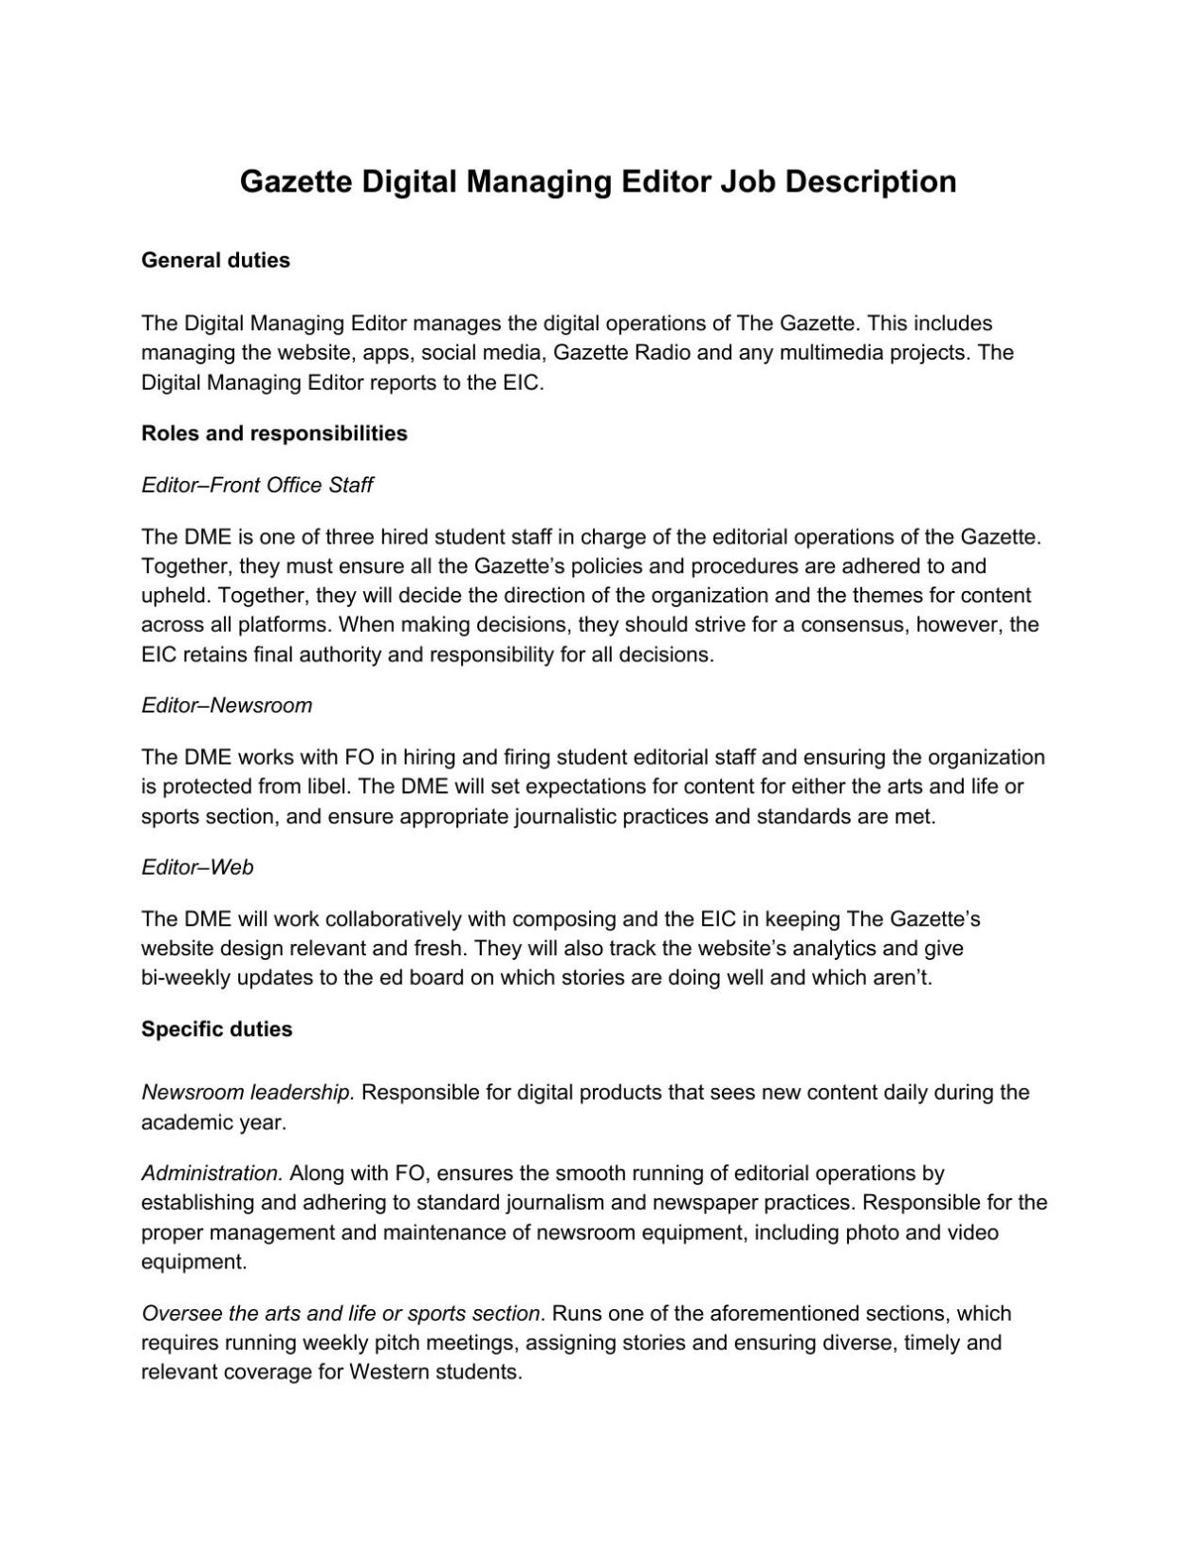 Digital Editor Job Description   Digital Managing Editor Application 2016 Pdf Westerngazette Ca